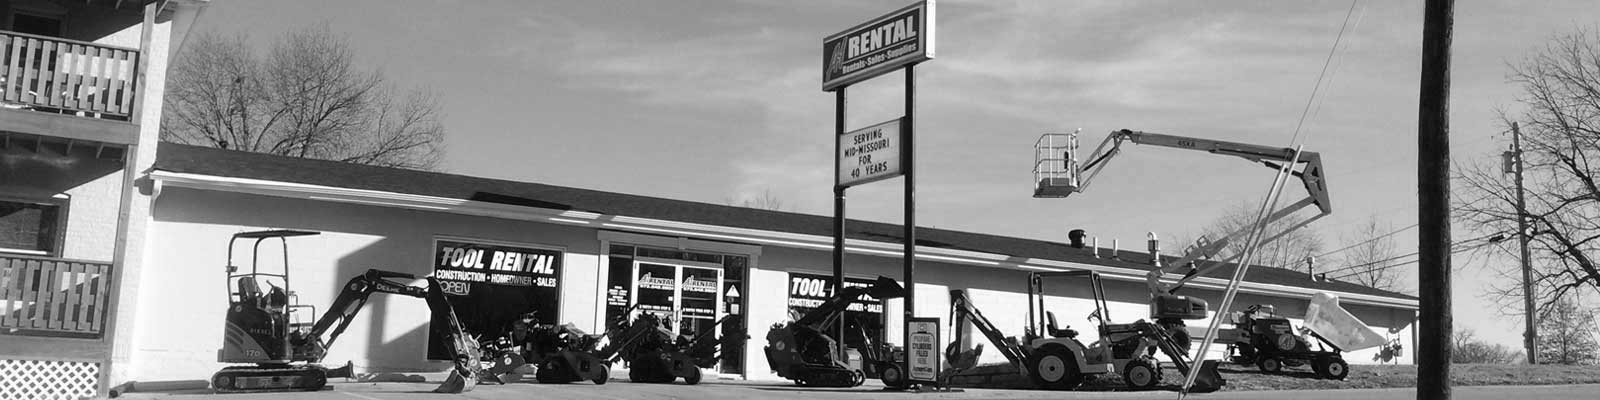 Equipment Rentals Fulton Mo Tool Rentals Jefferson City Mo